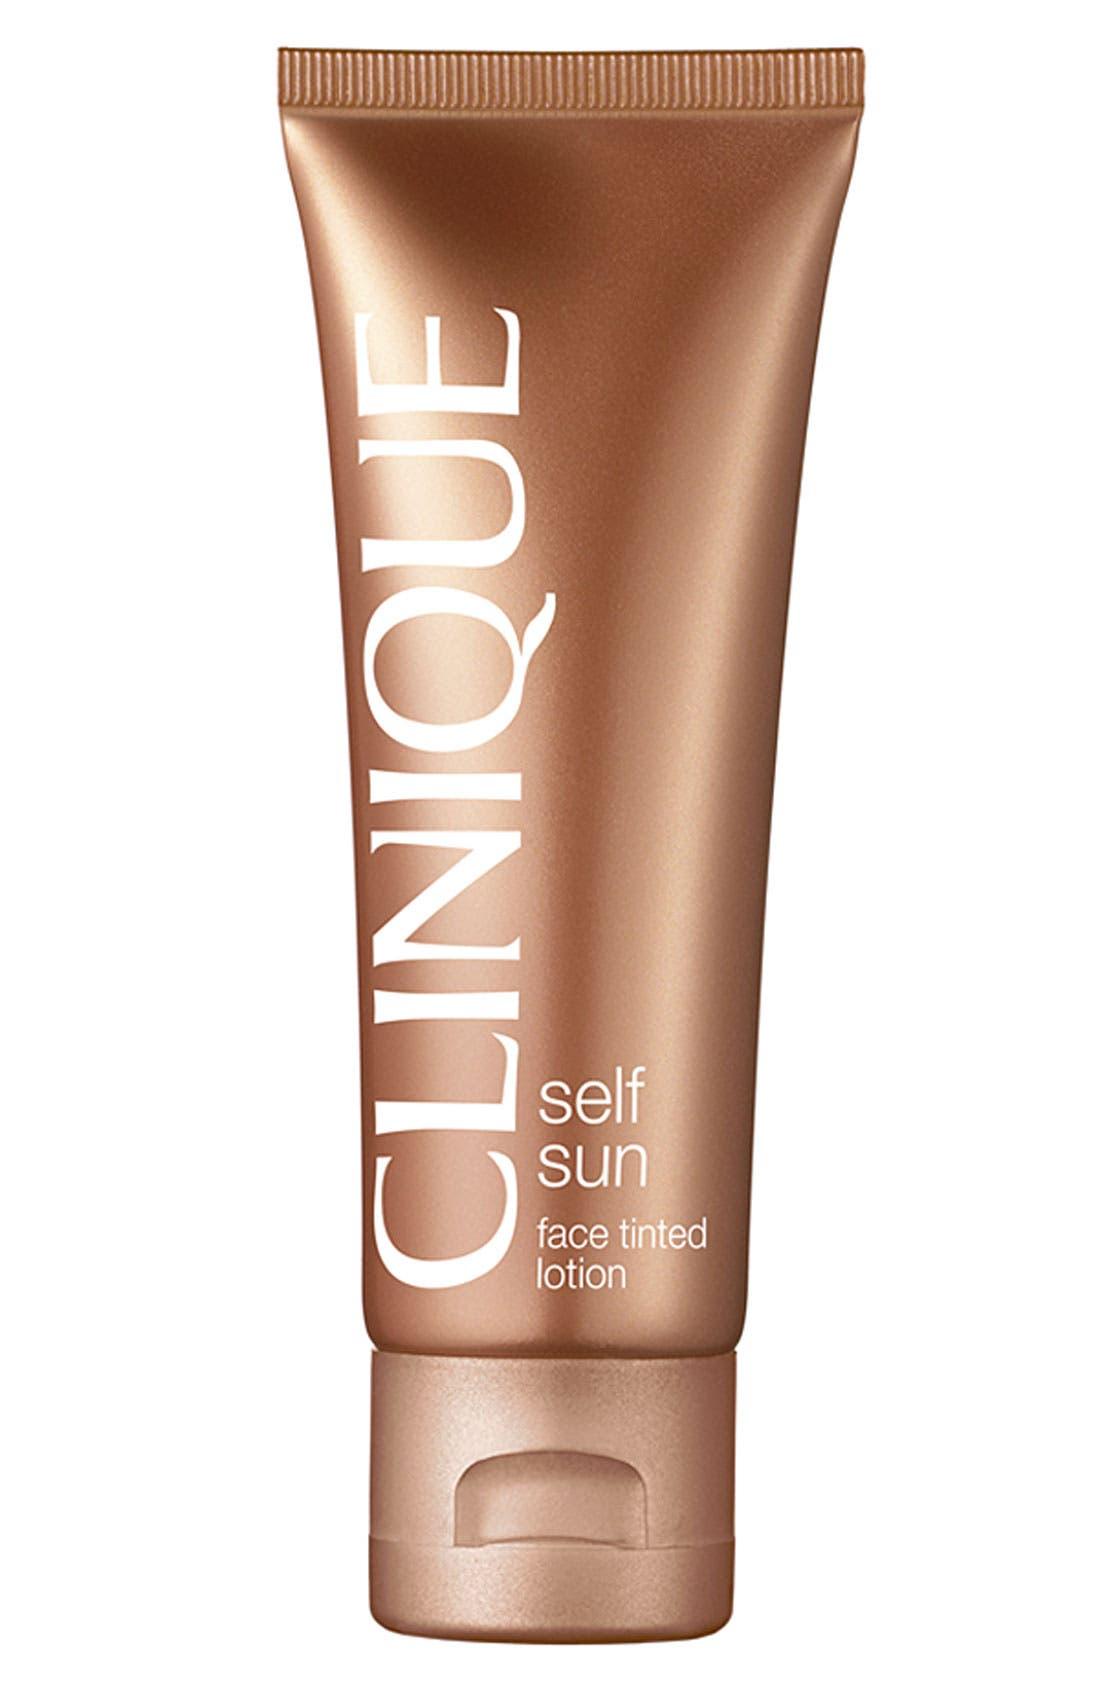 CLINIQUE, Self Sun Face Tinted Lotion, Main thumbnail 1, color, NO COLOR